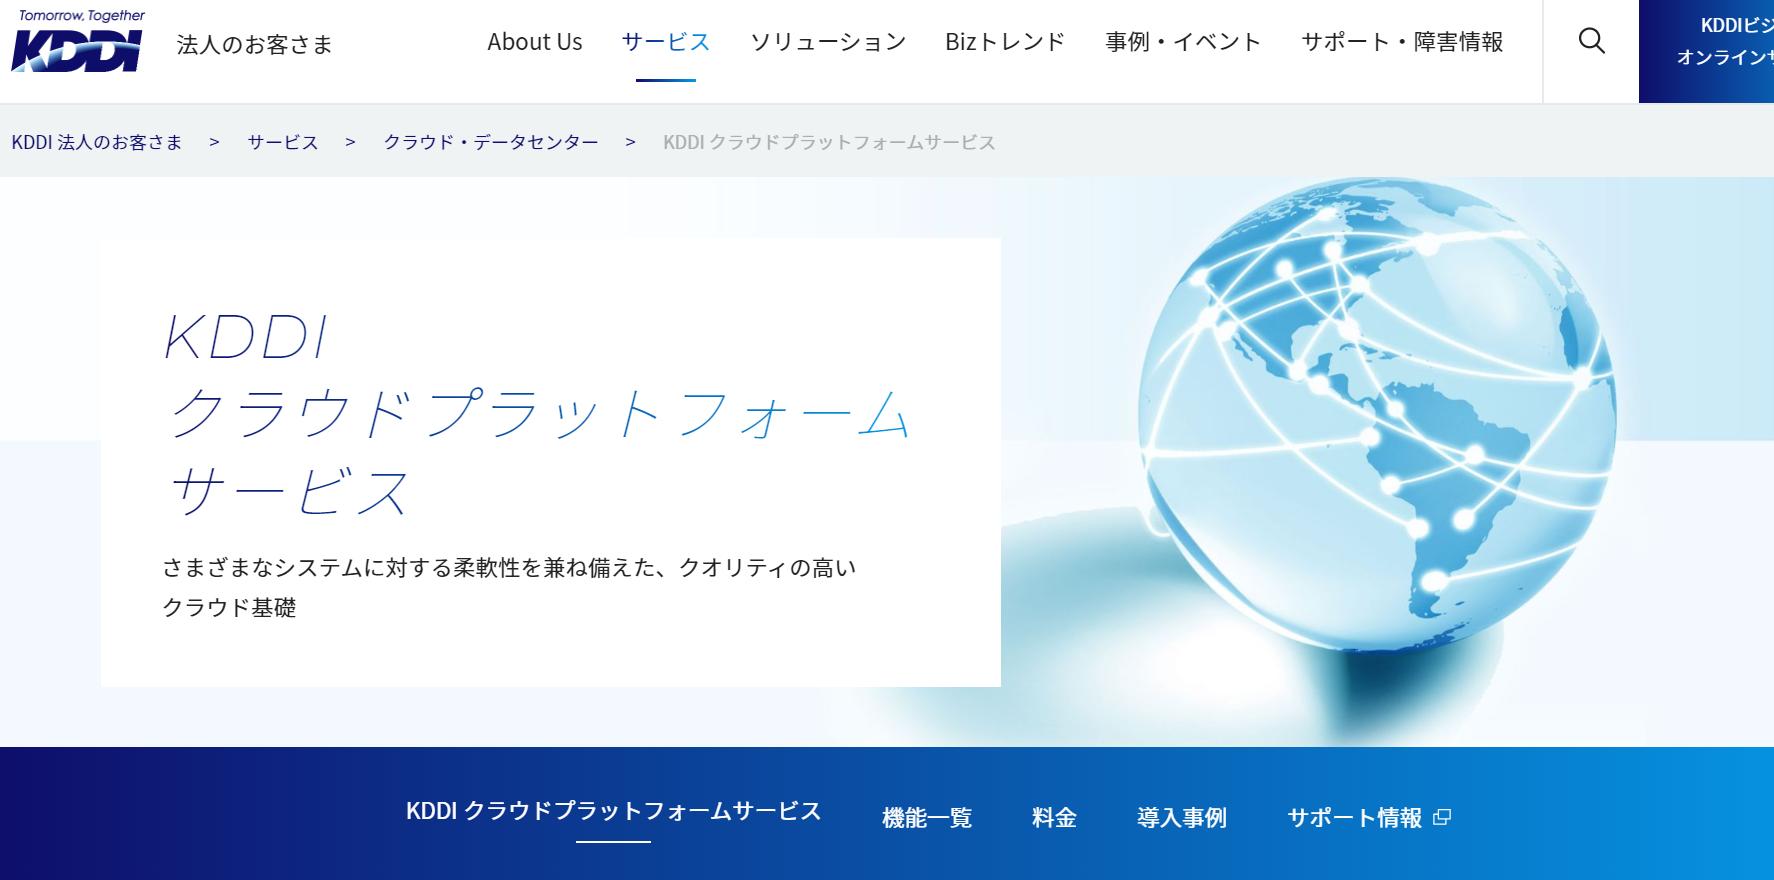 KDDIクラウドプラットフォームサービス公式Webサイト